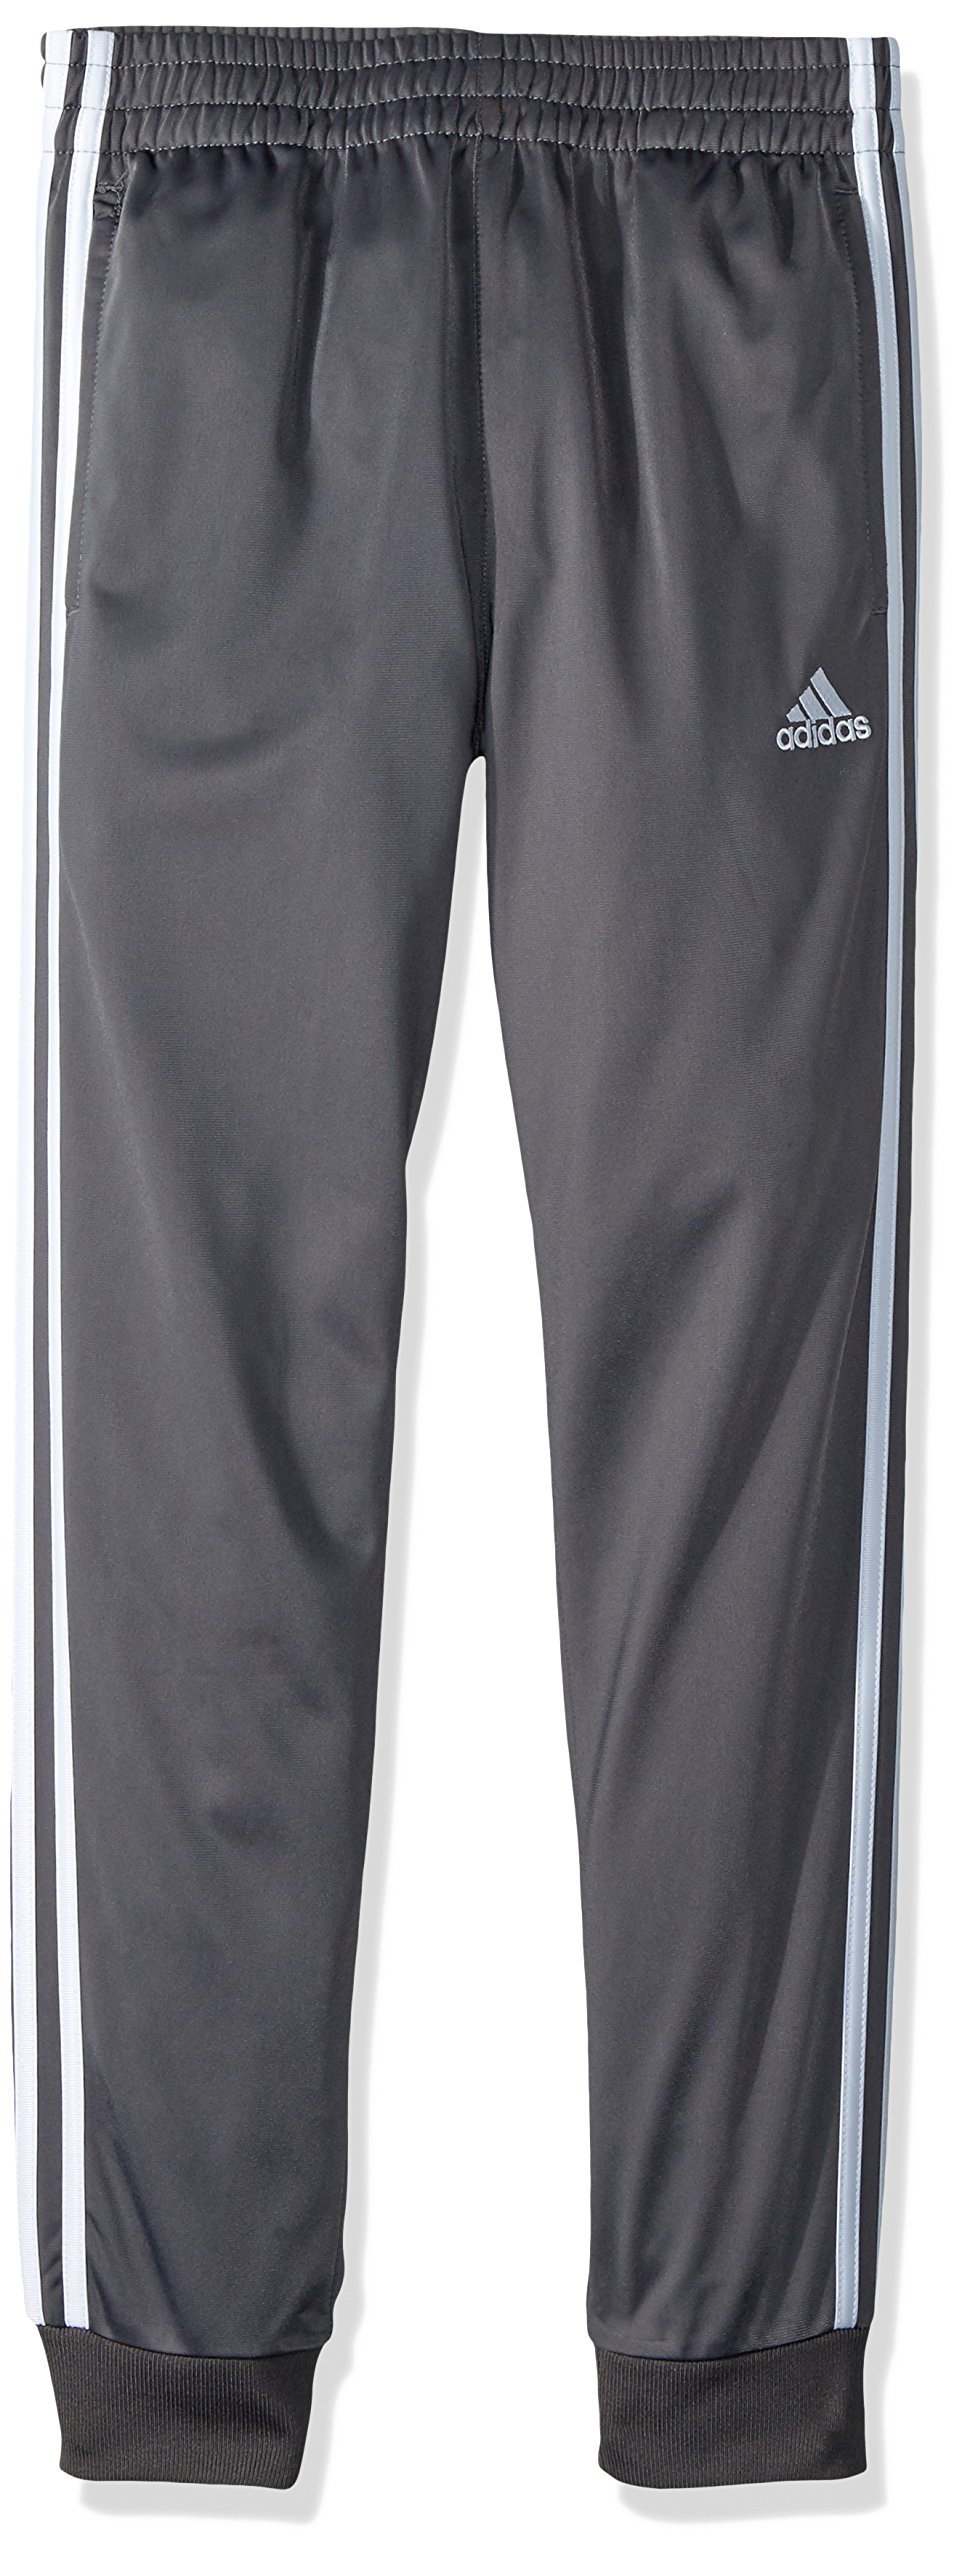 adidas Boys' Big Jogger Pant, Dark Grey Heather, X-Large